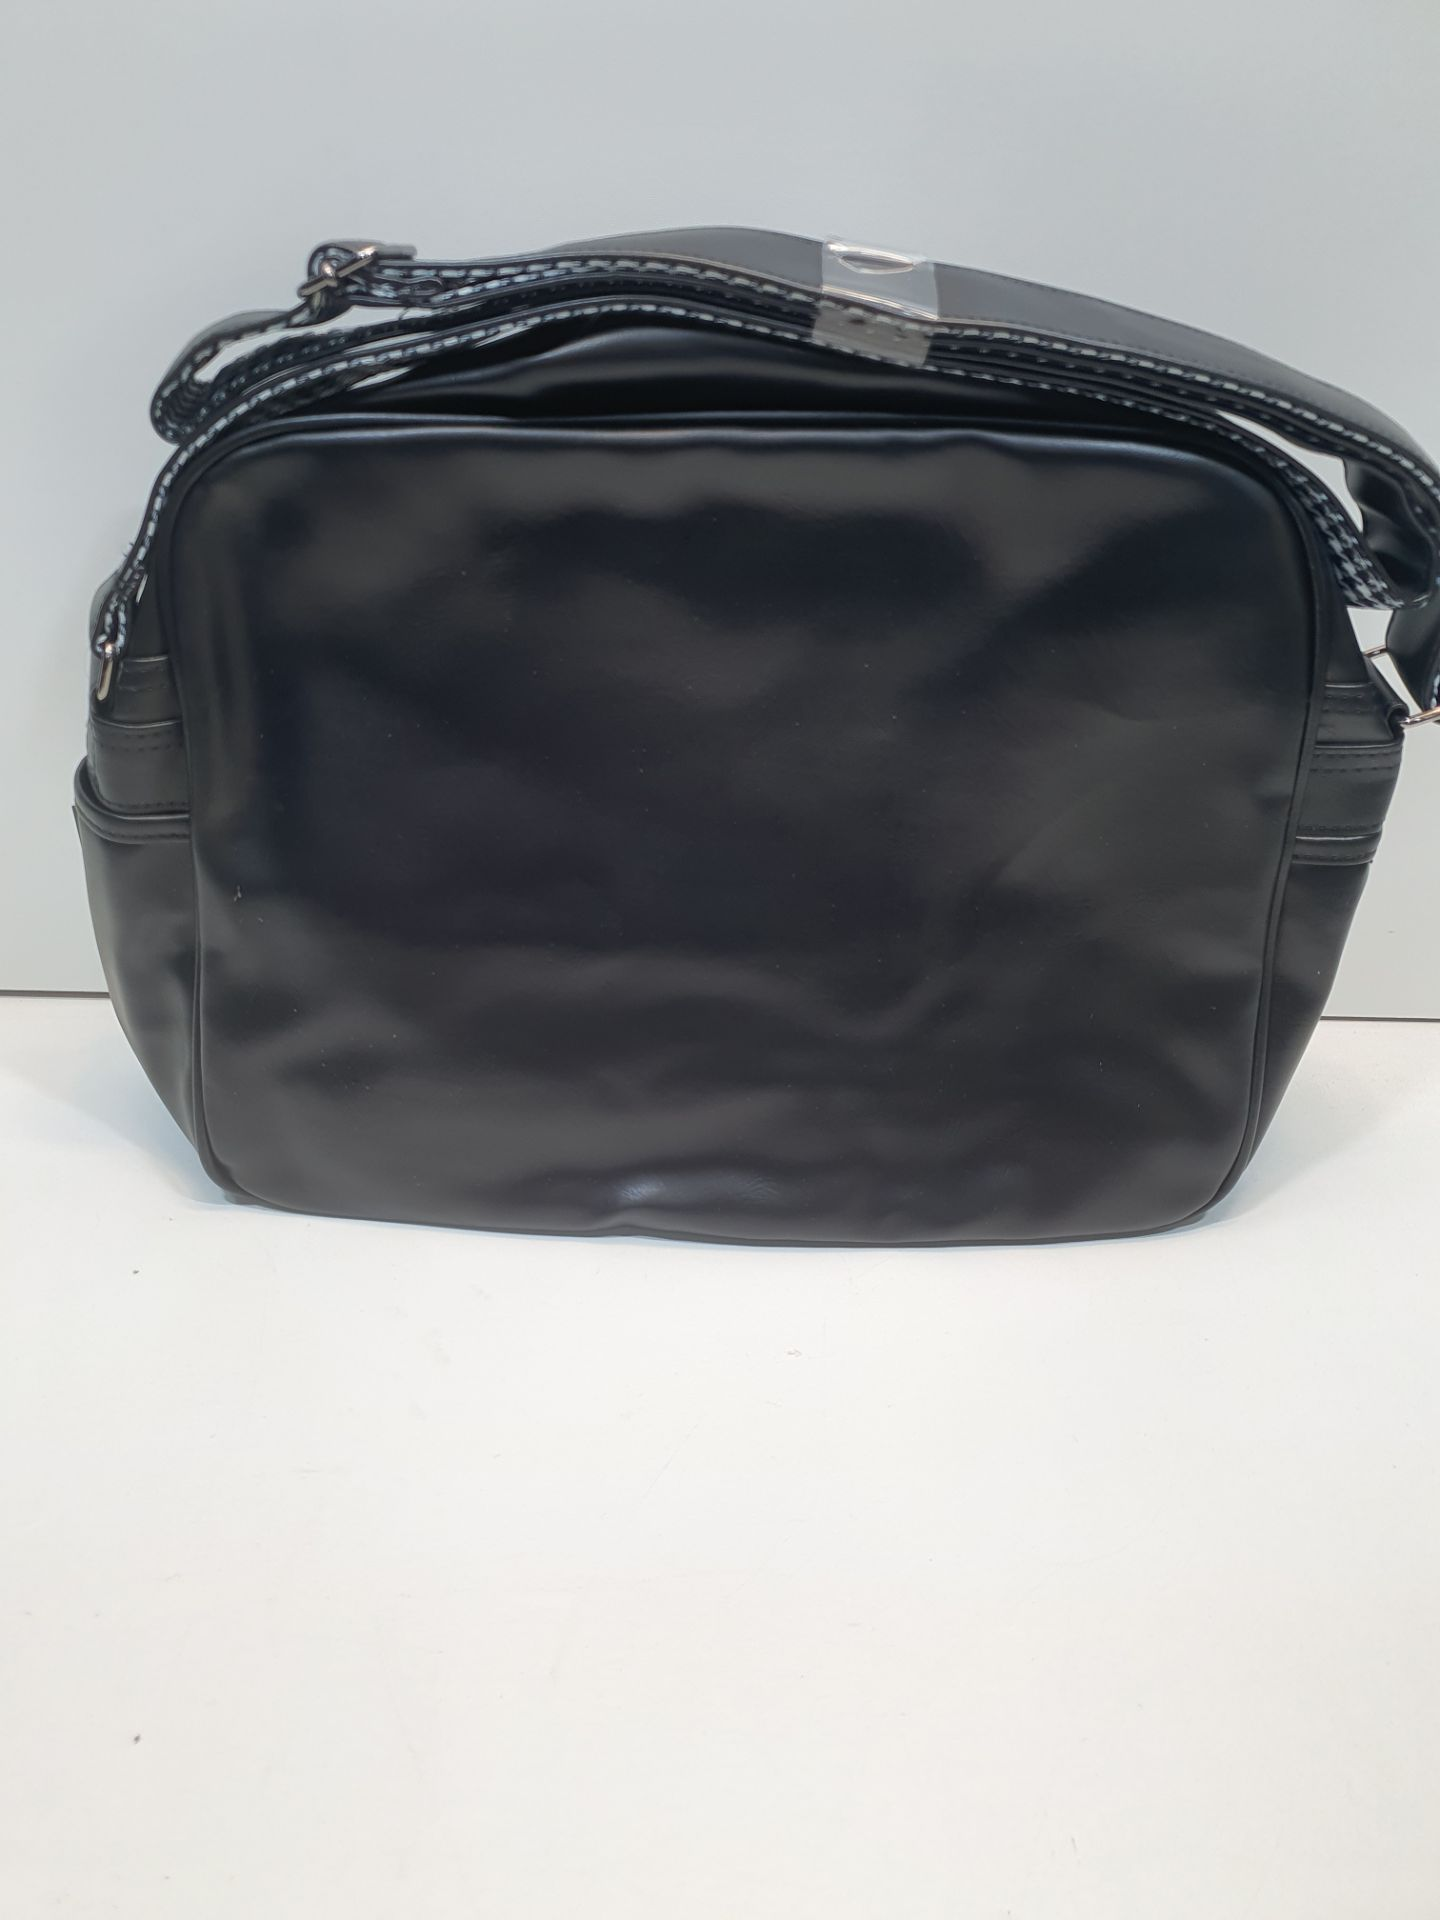 Dunlop PVC Flight Bag - Image 2 of 3